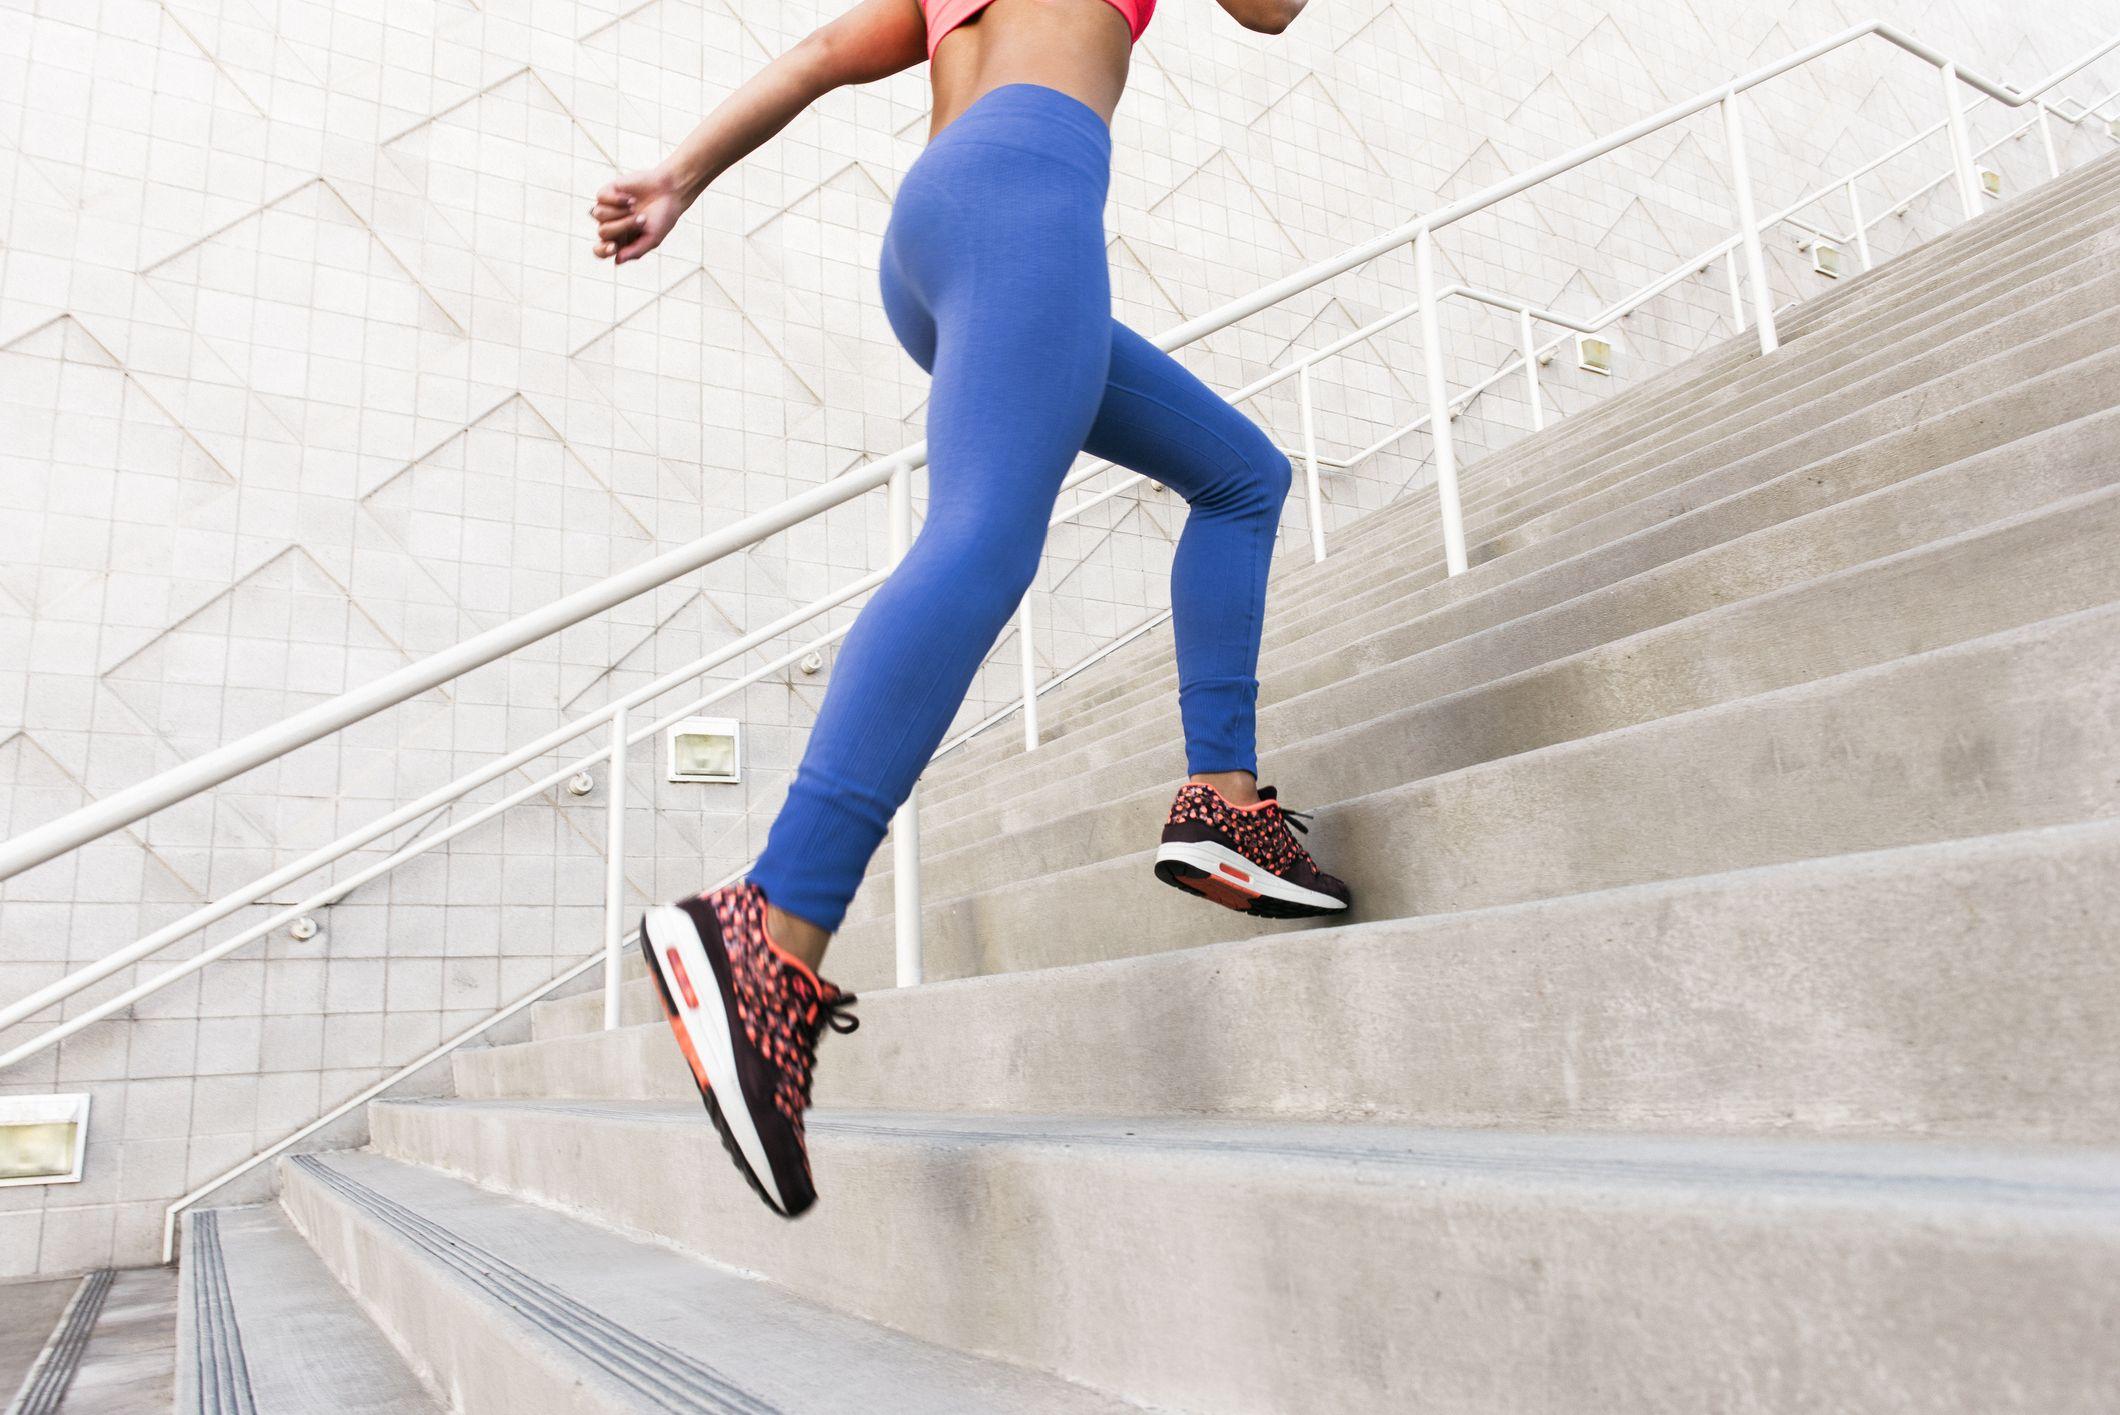 Lululemon: Müssen es unbedingt die teuren Sport-Leggings sein?